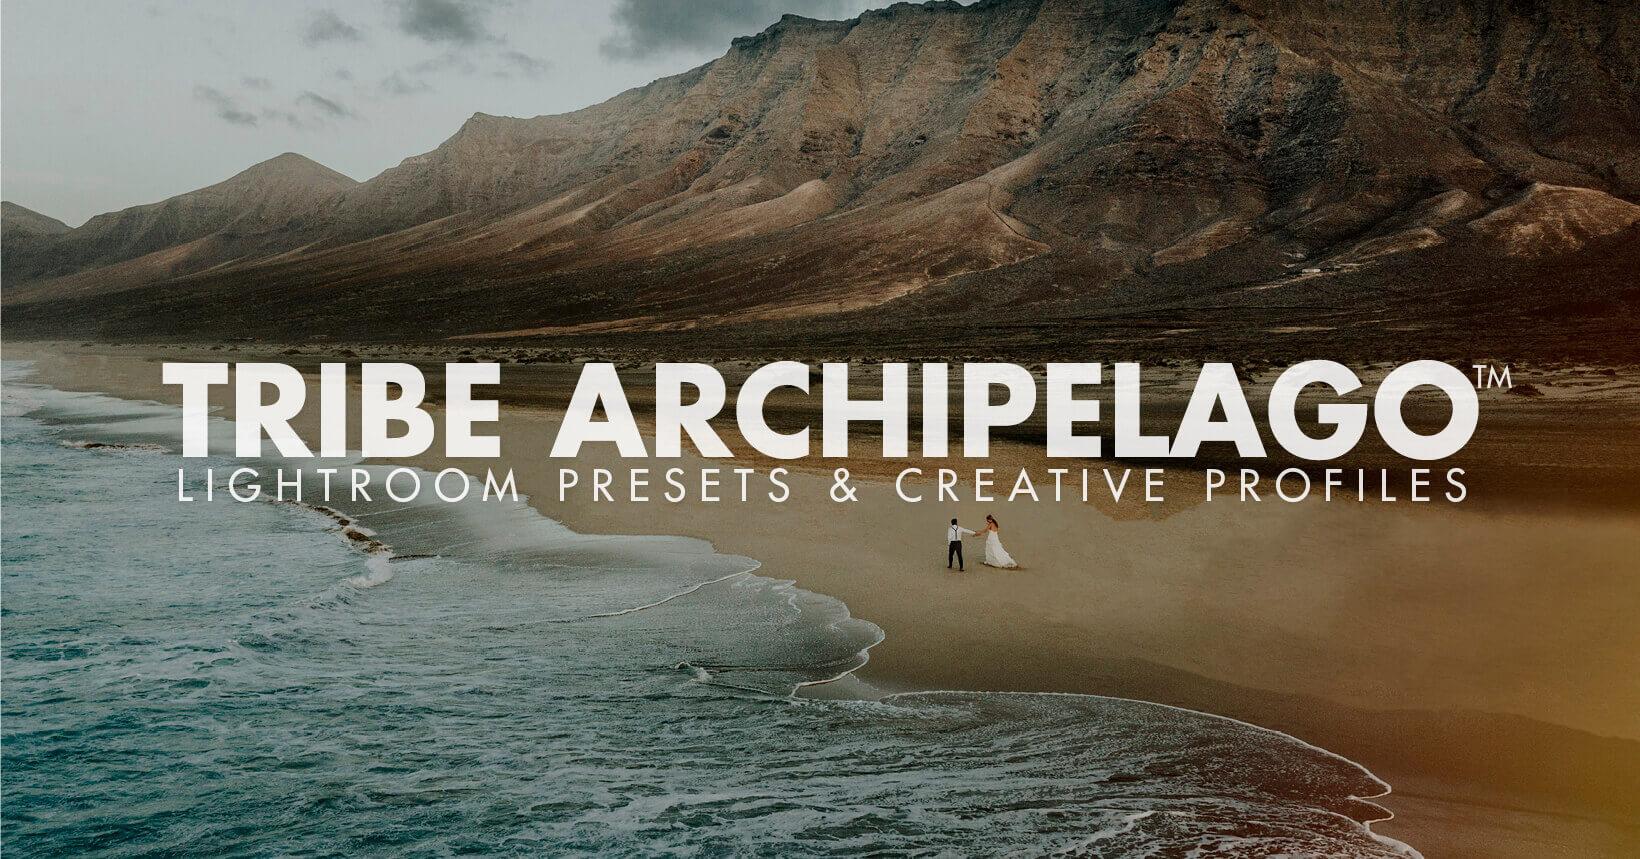 TRIBE-ARCHIPELAGO-presets